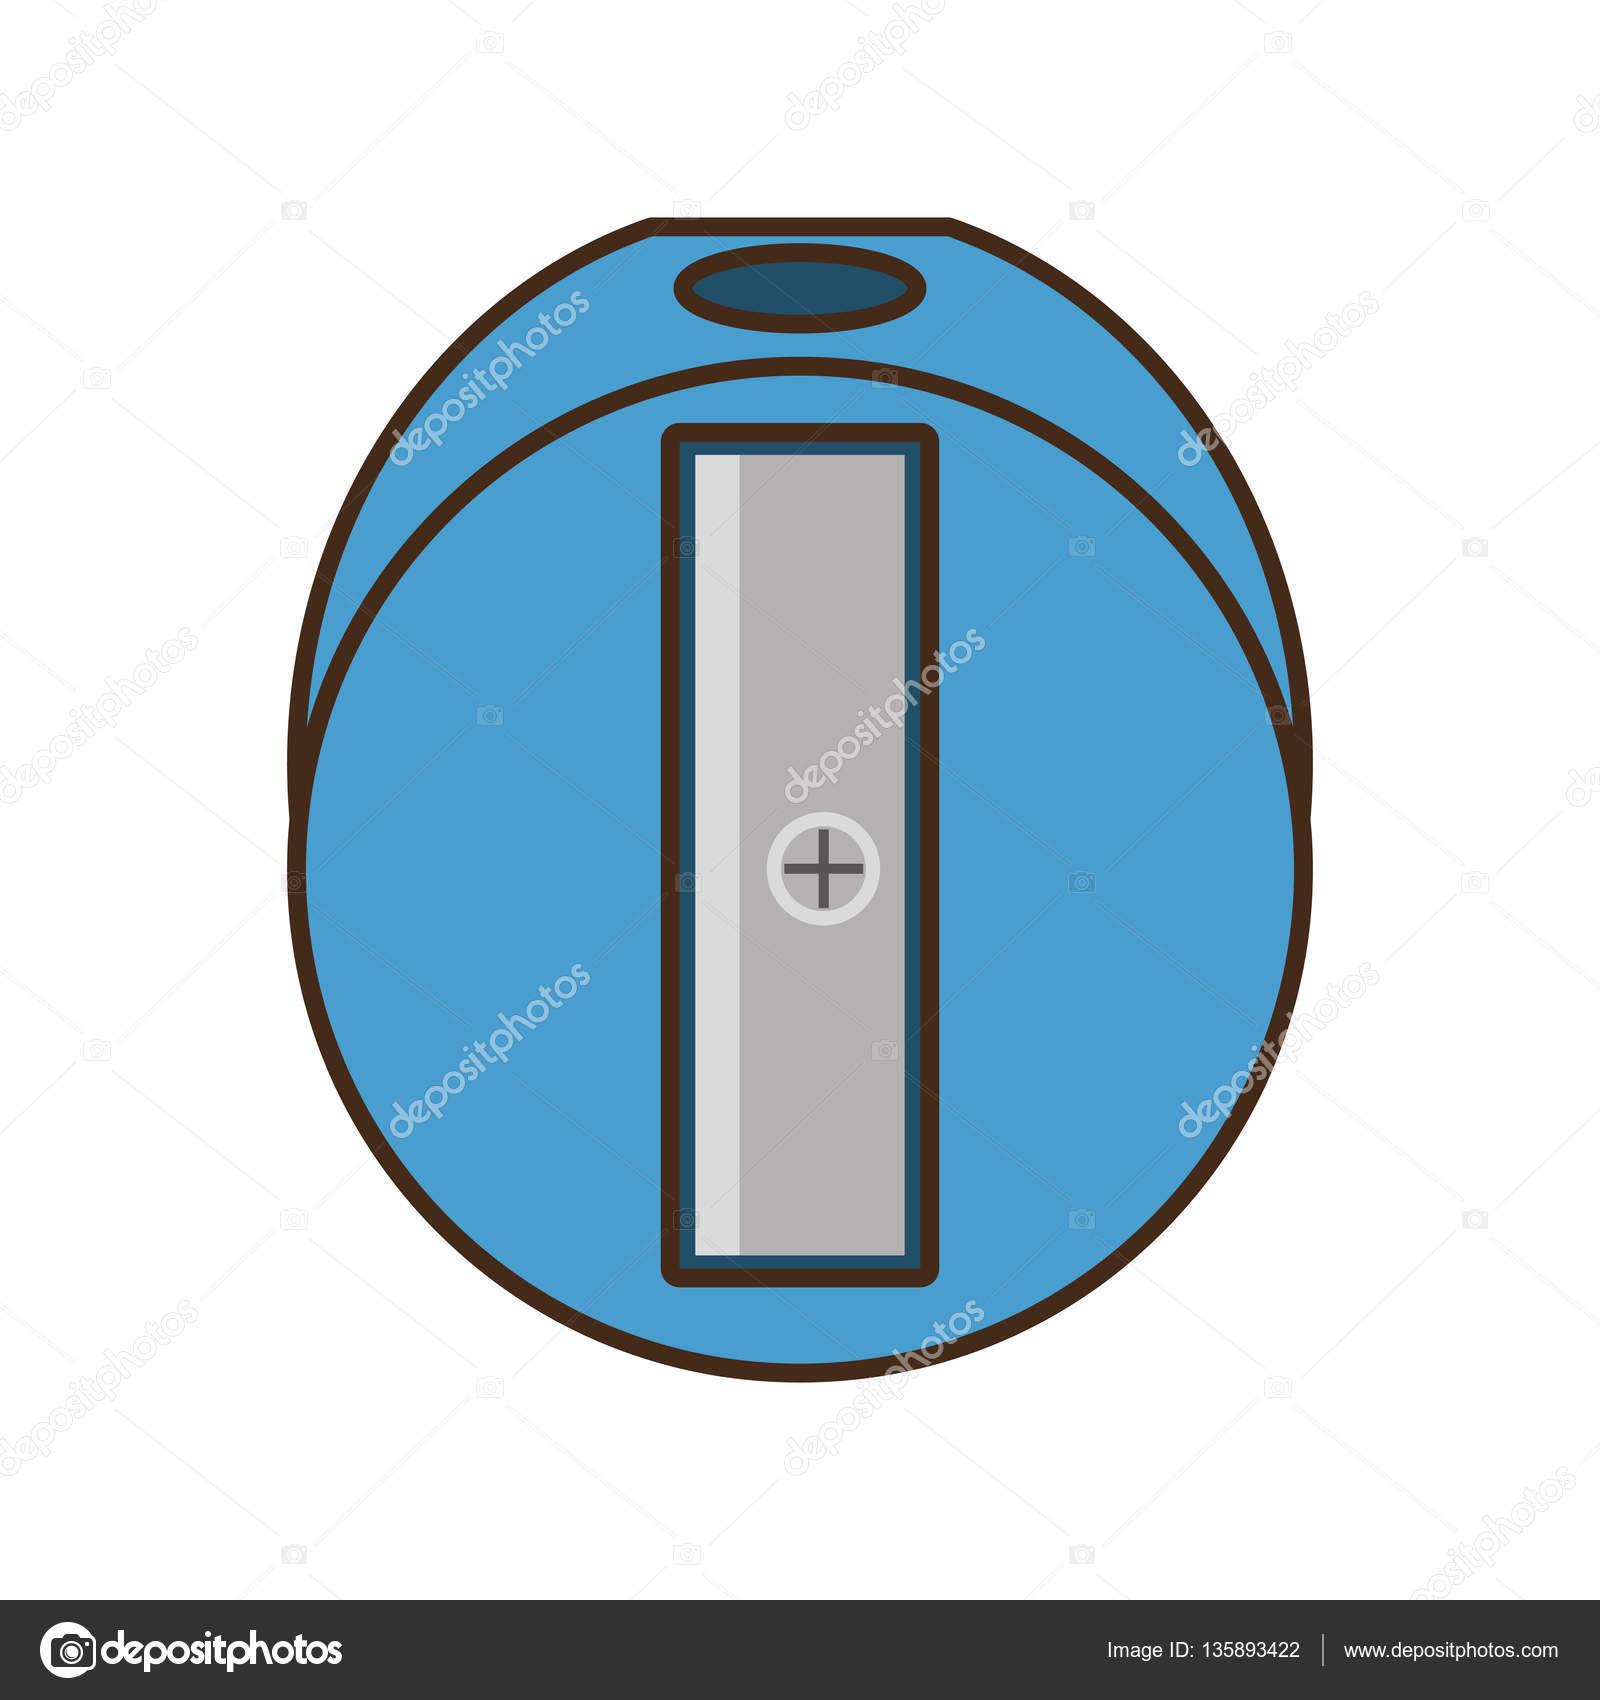 ritning blå pennvässare pennverktyget skola — Stock Vektor © djv ... d04a4a286864a